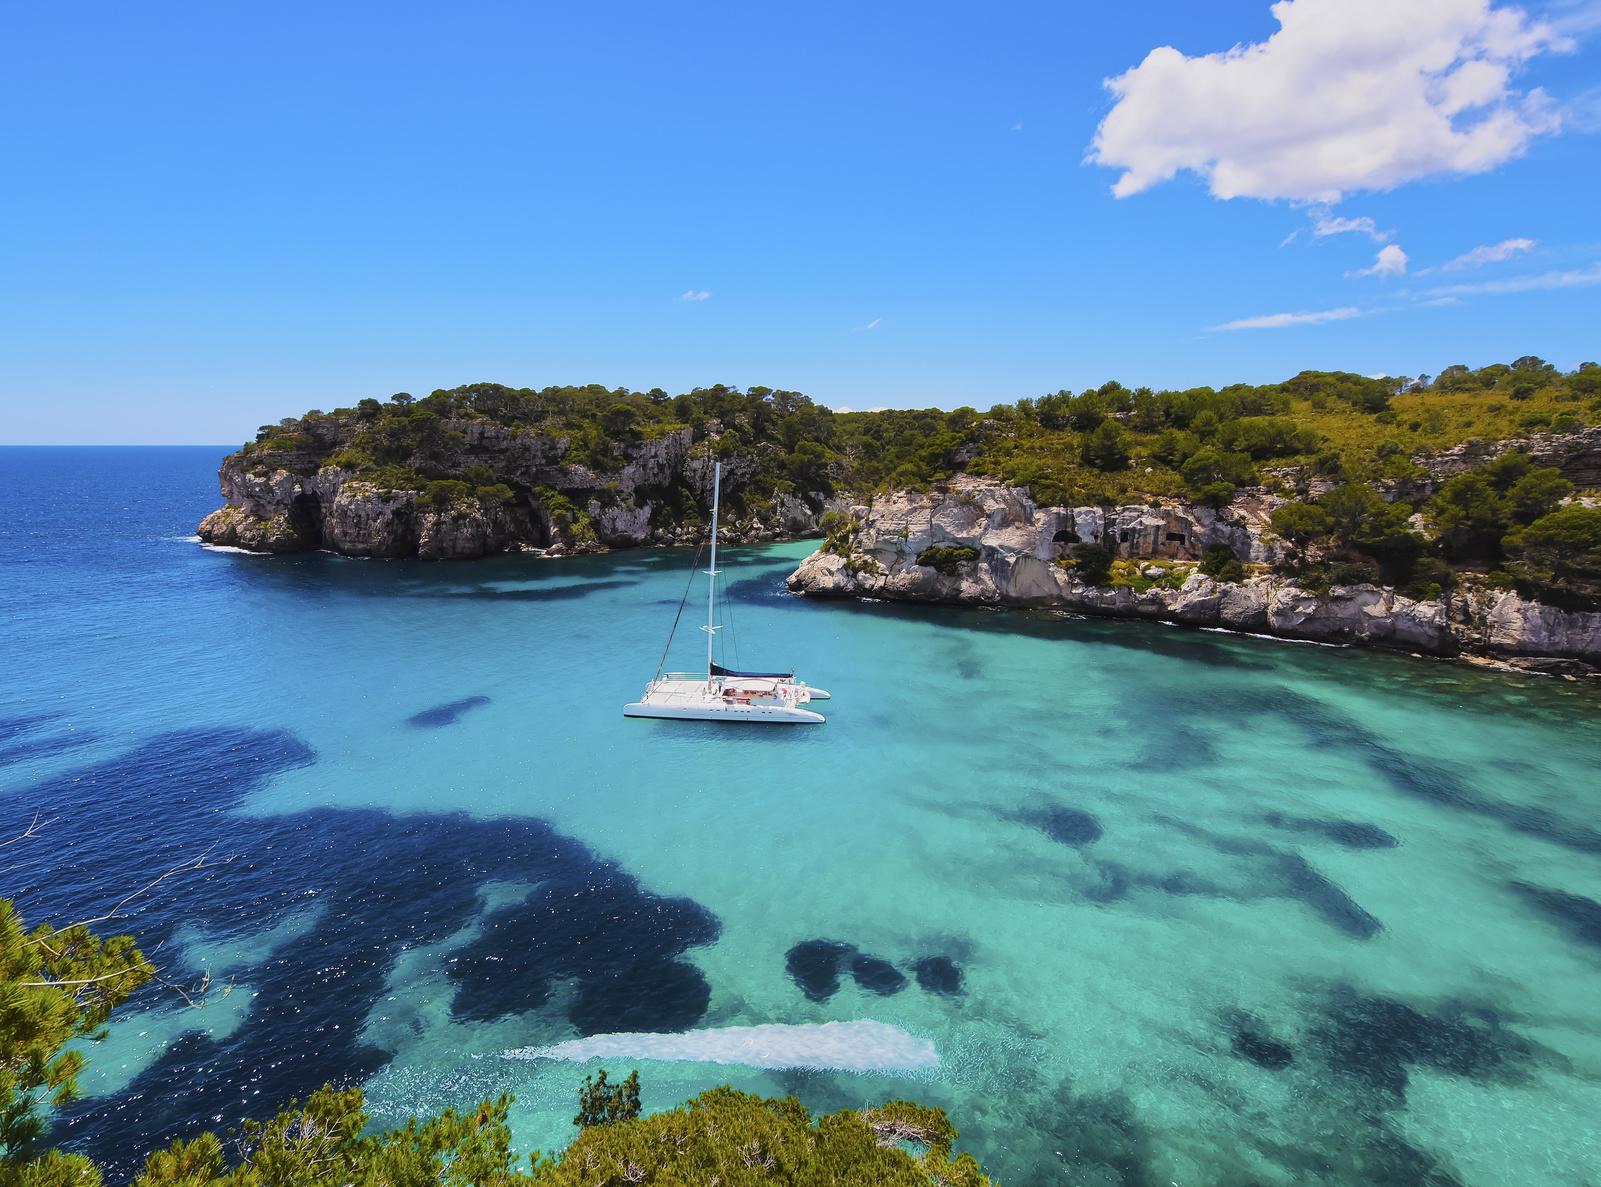 Catamaran in the Mediterranean